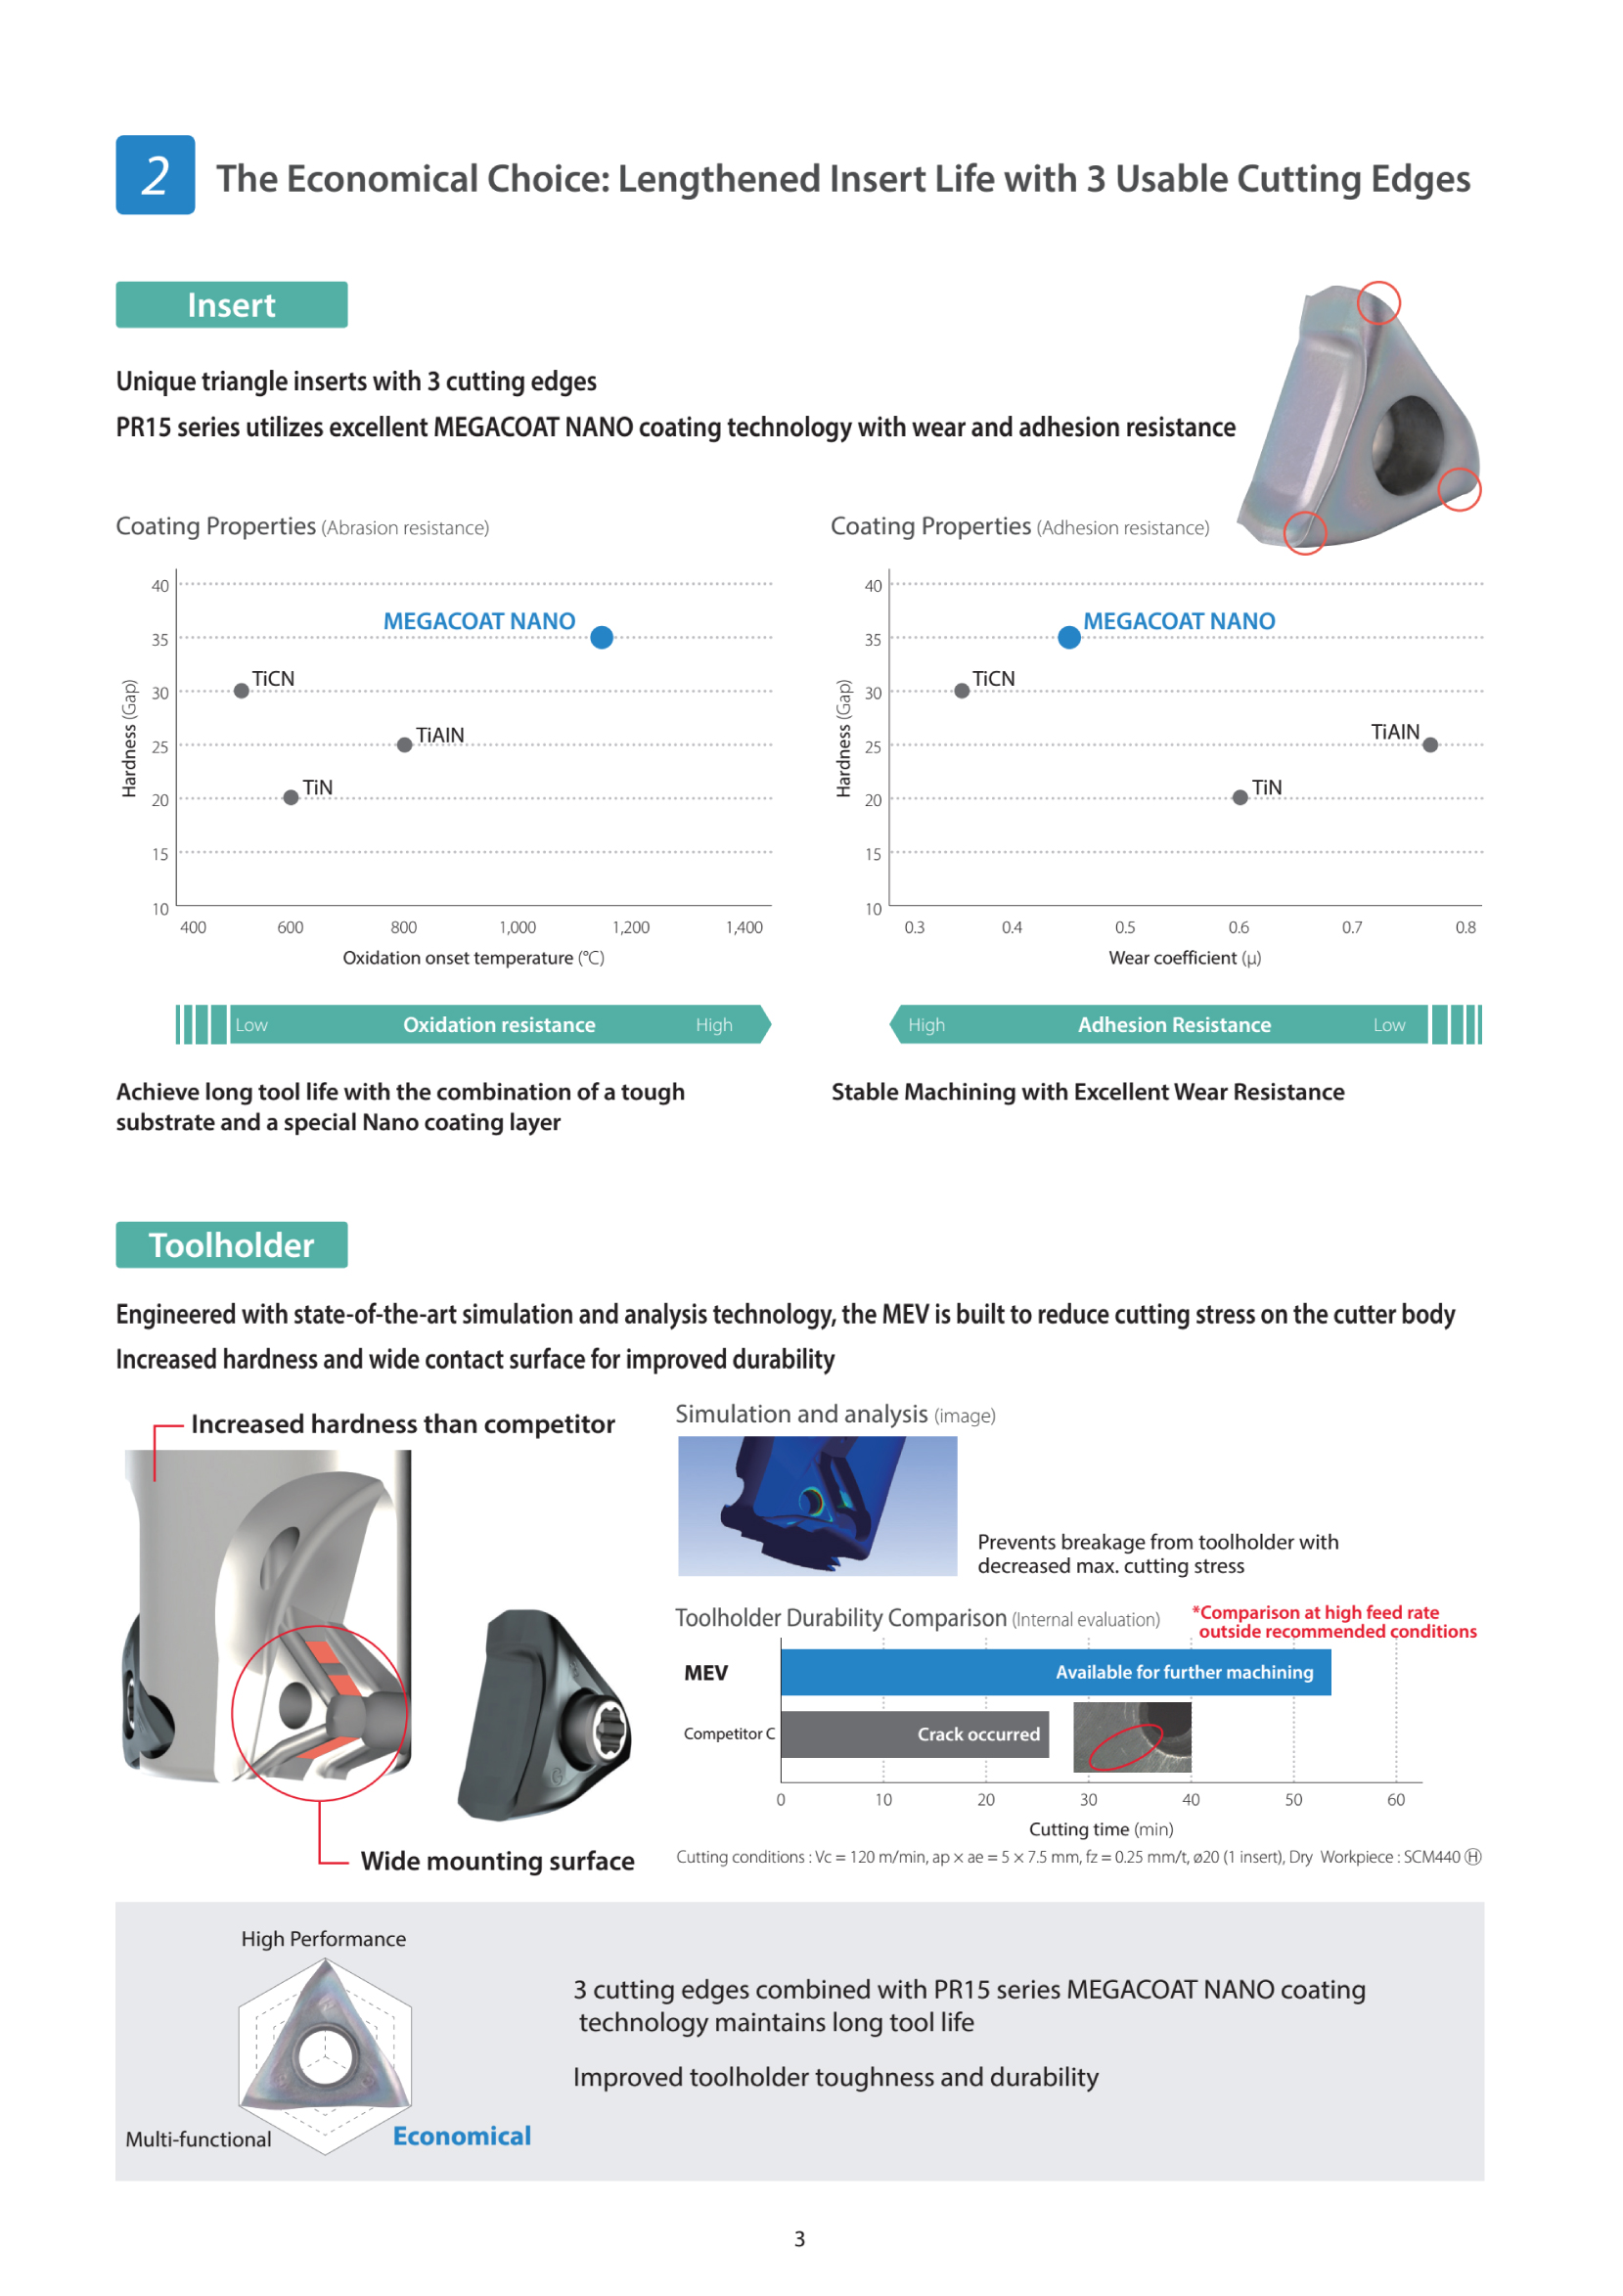 Dao phay gắn mảnh Kyocera MEV hiệu suất cao 4